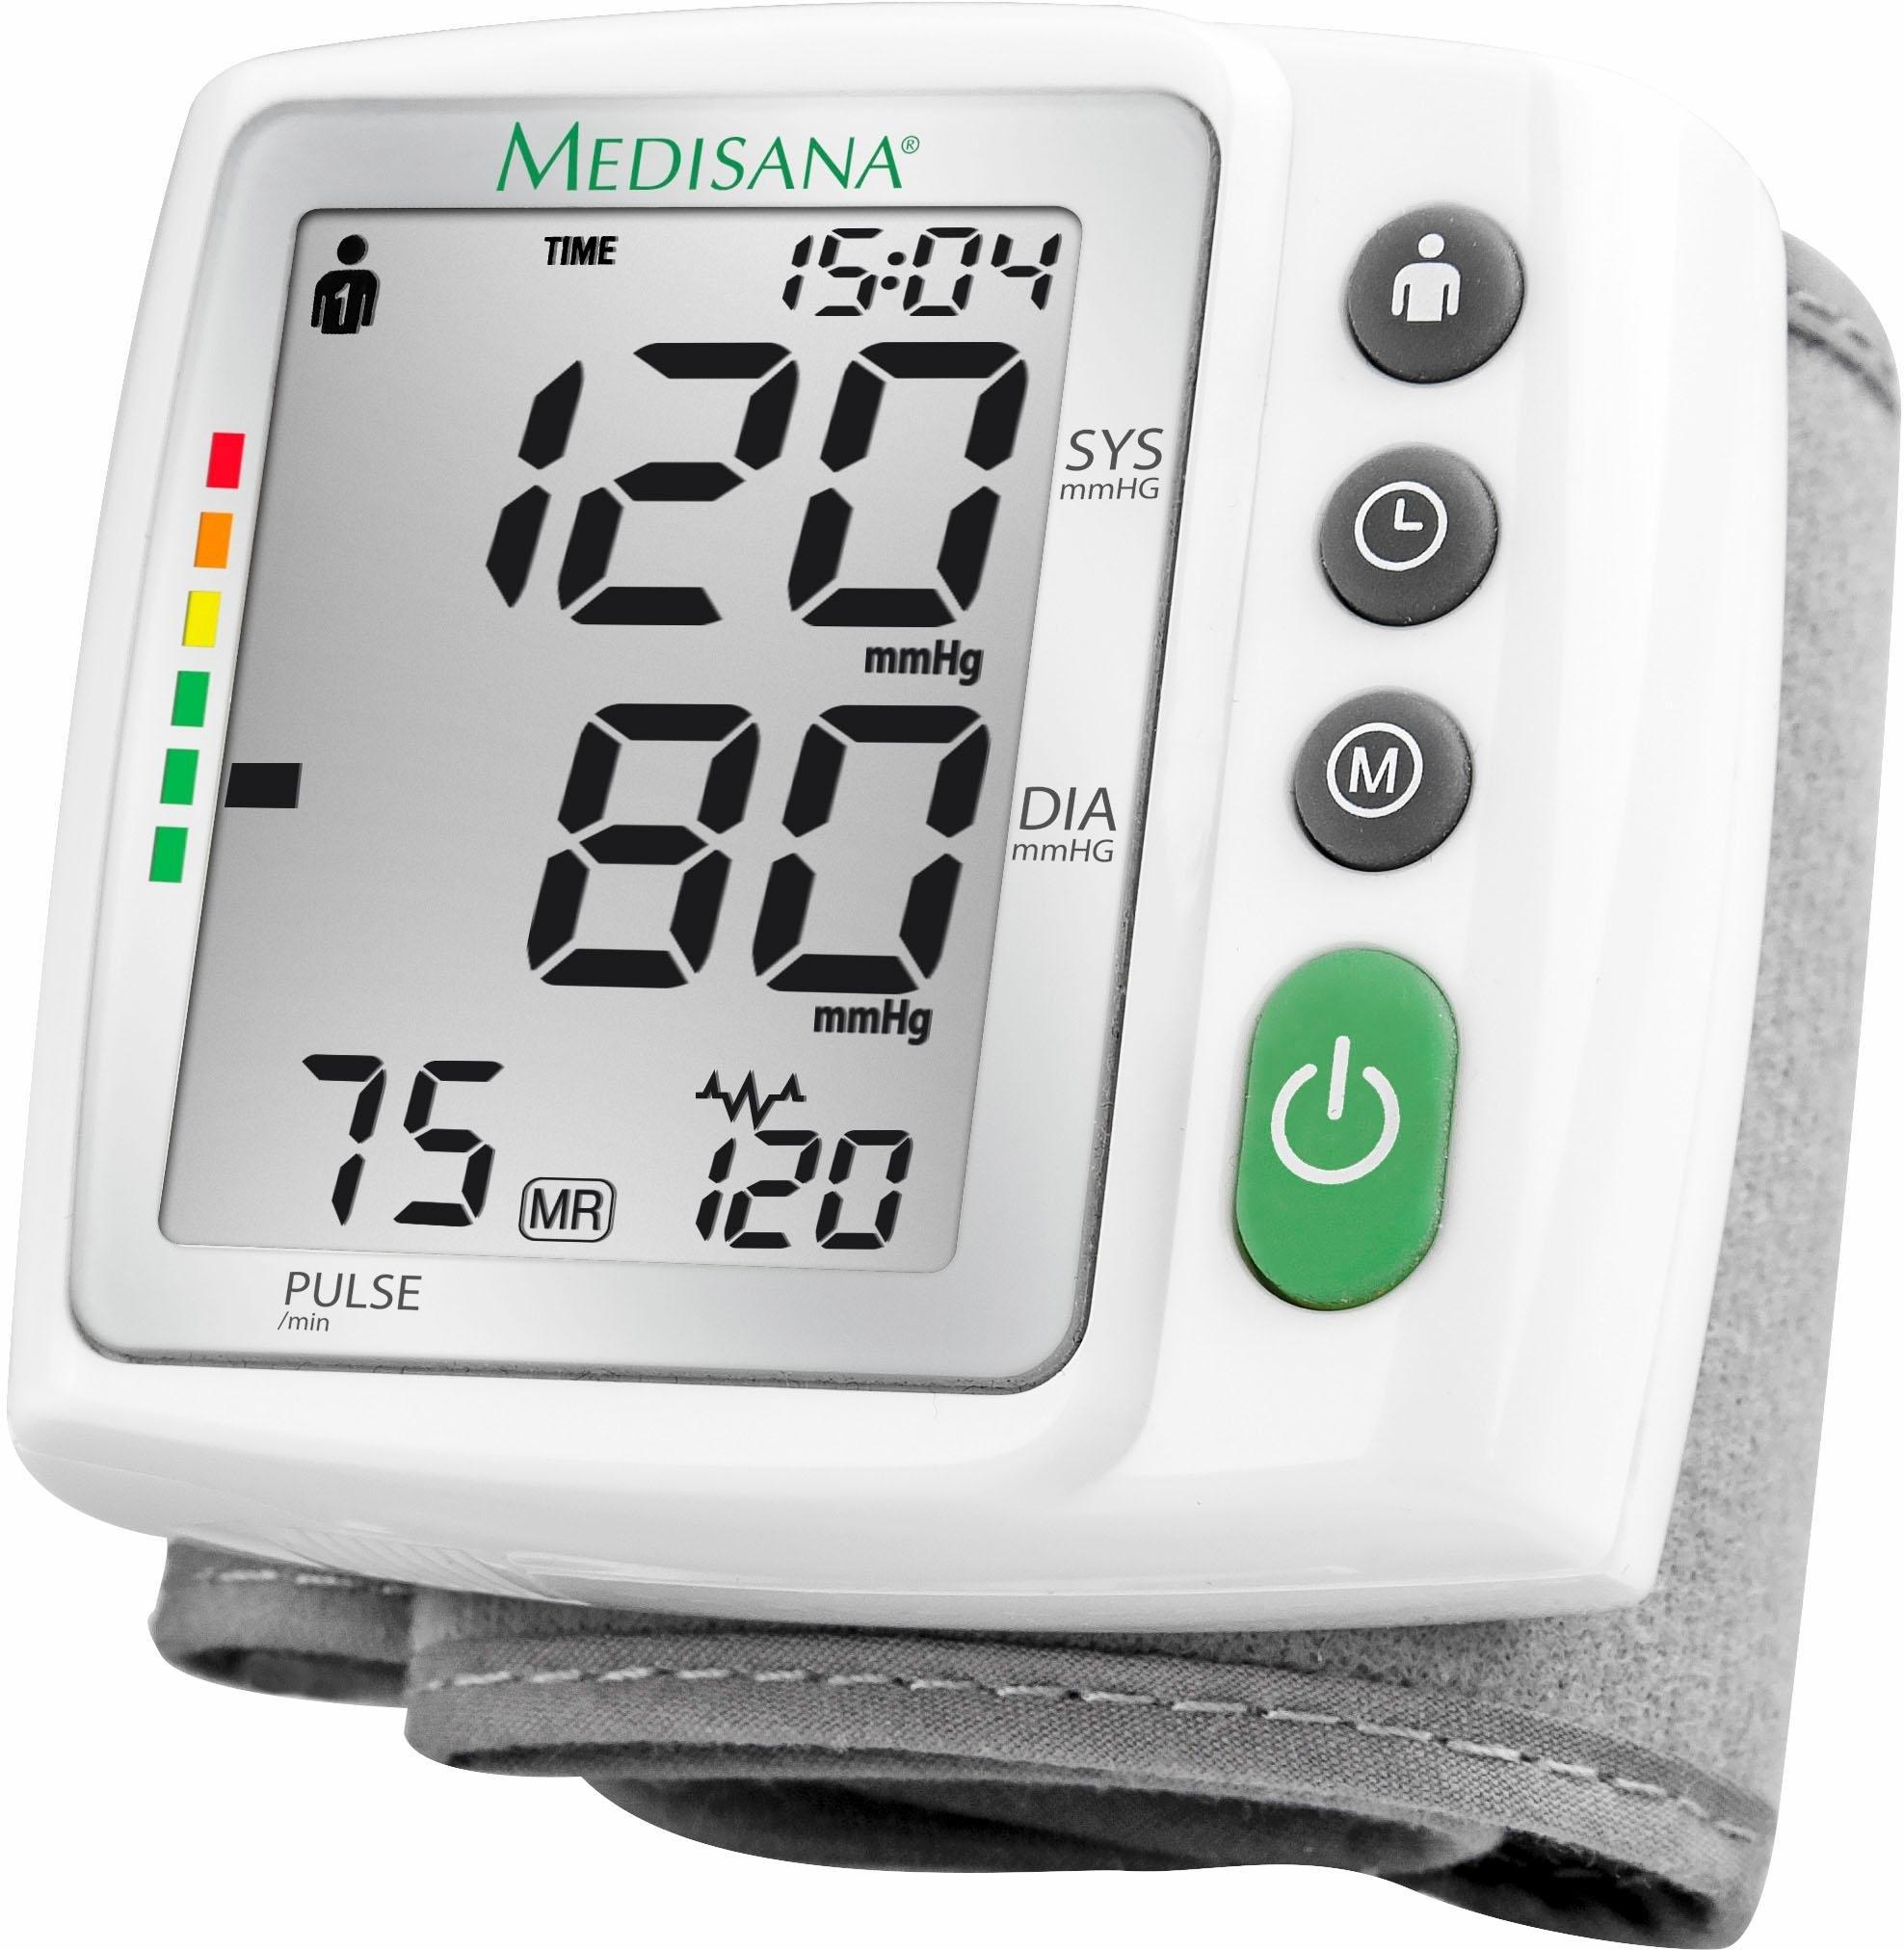 Medisana pols-bloeddrukmeter BW 315 nu online kopen bij OTTO